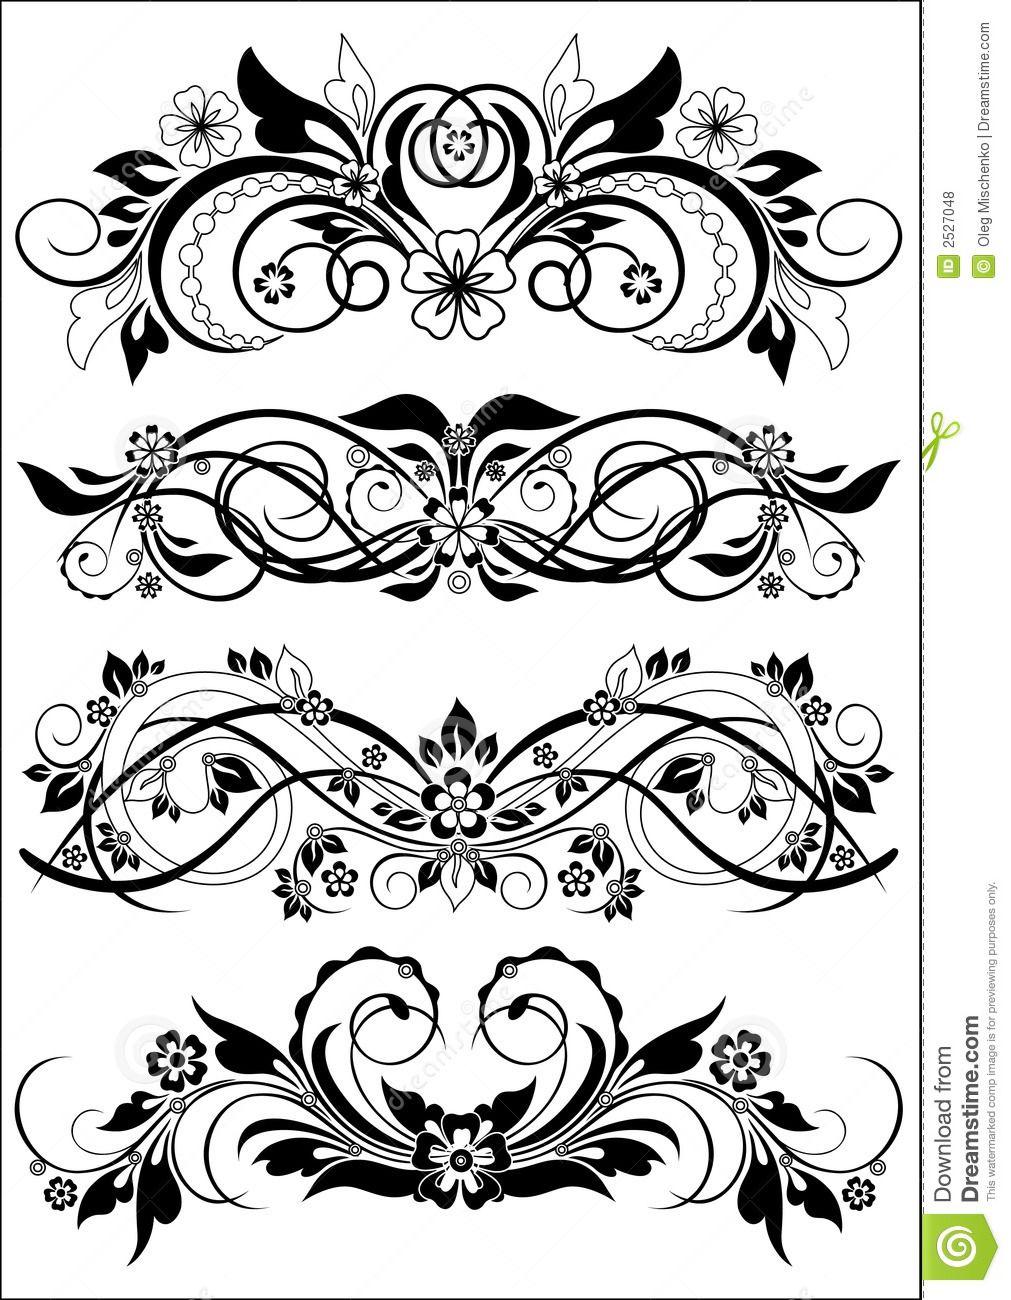 Decorative Patterns Cool Design Ideas